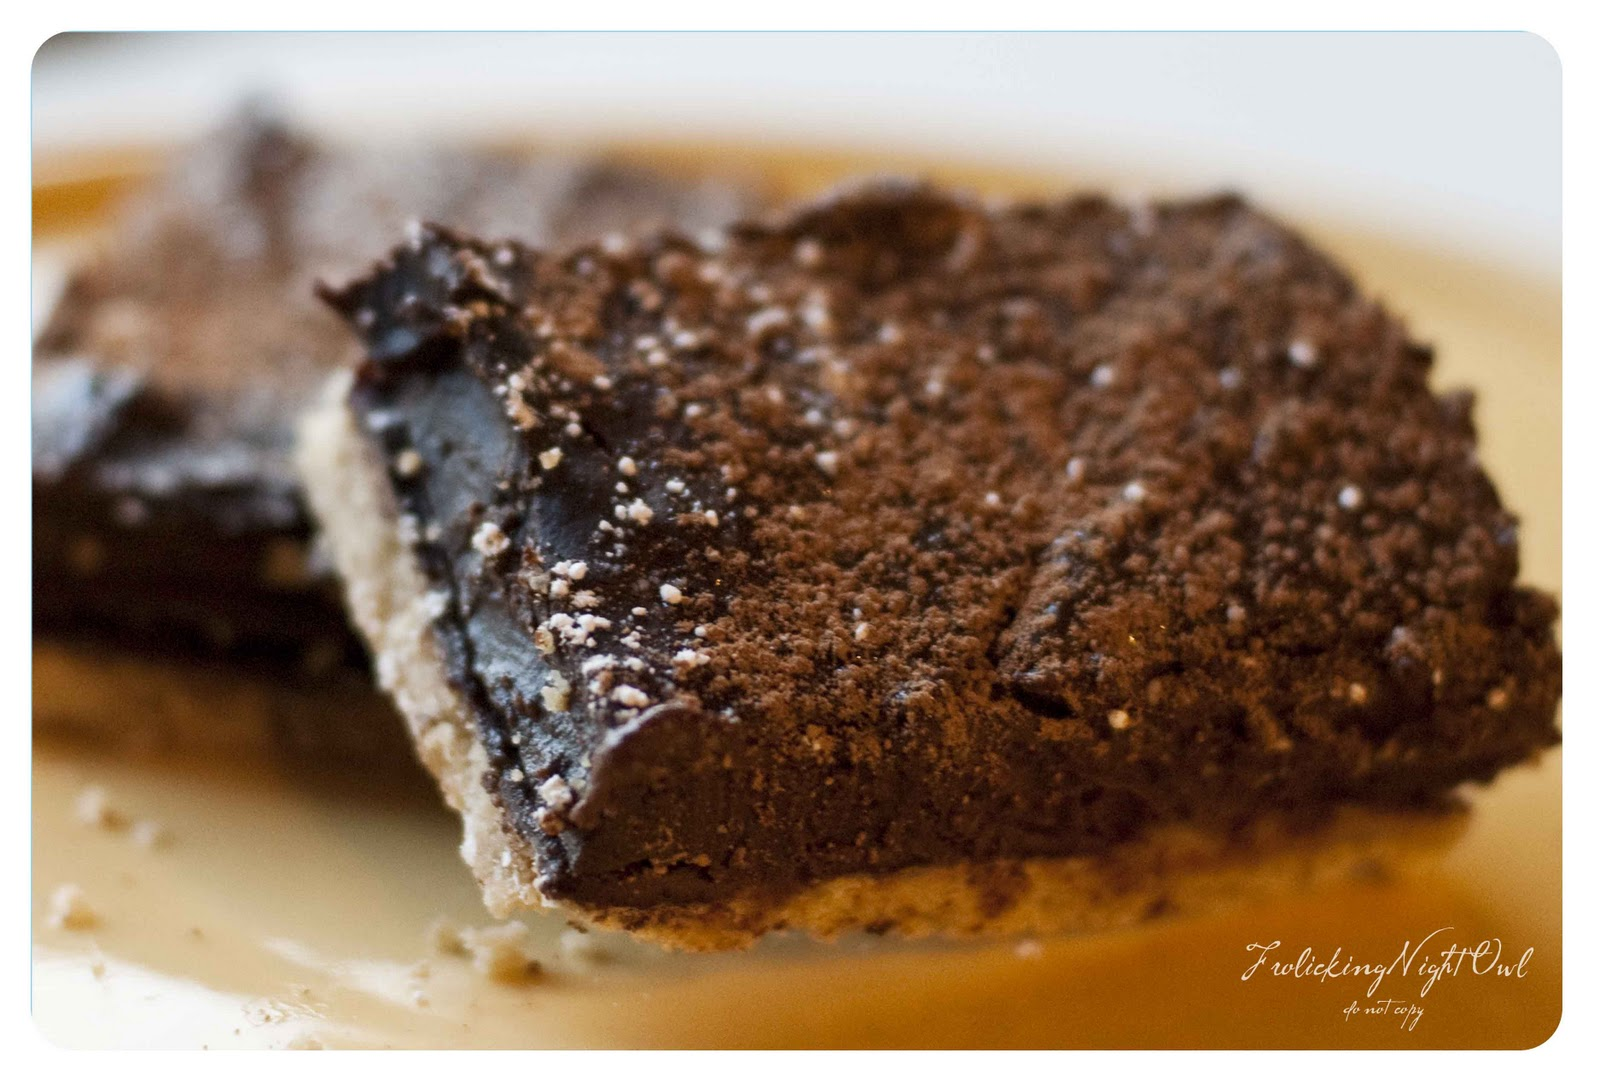 Frolicking Night Owl: Alice Medrich's Chocolate Pudding Bars